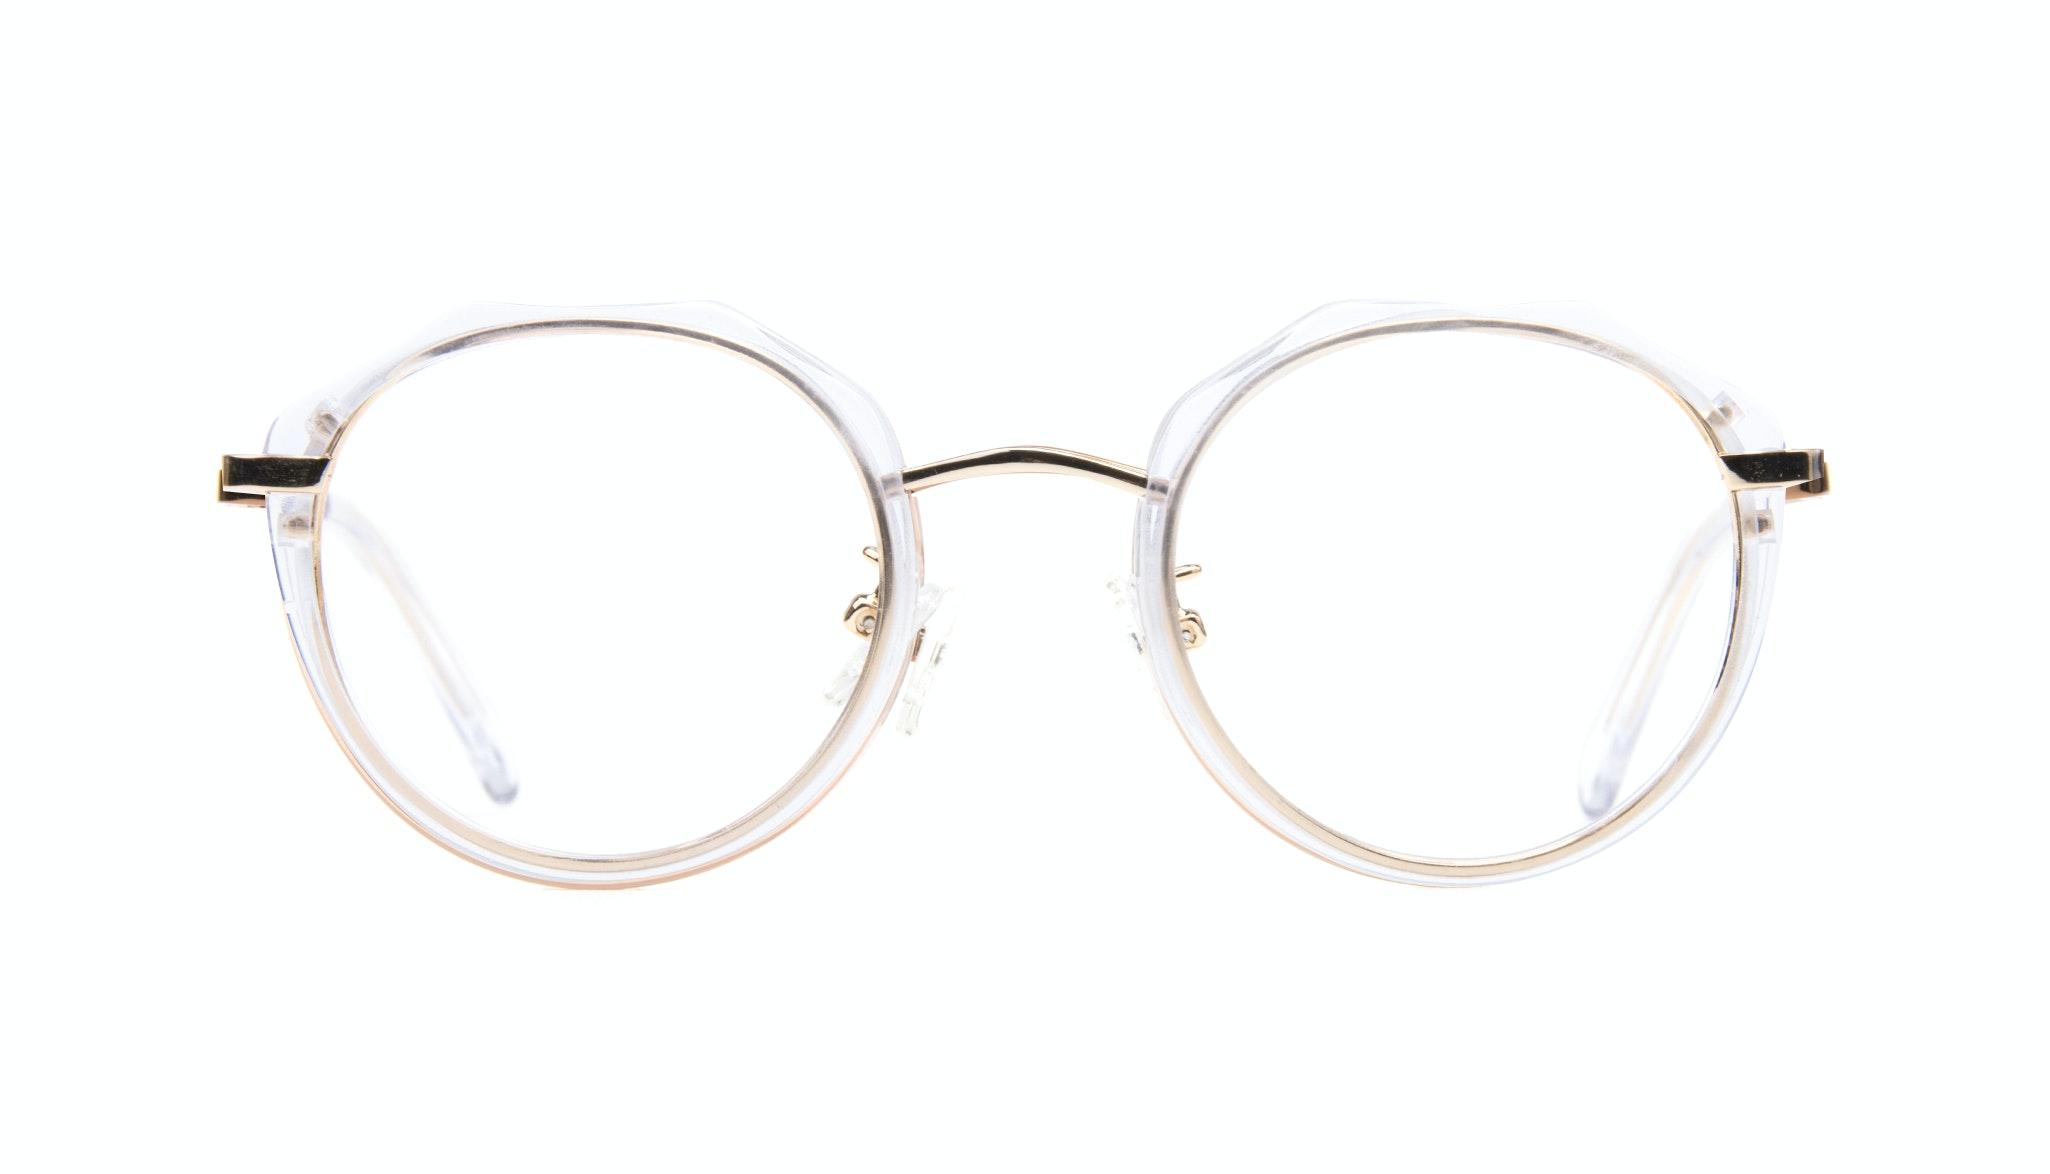 Affordable Fashion Glasses Round Eyeglasses Women Vitality Gold Diamond